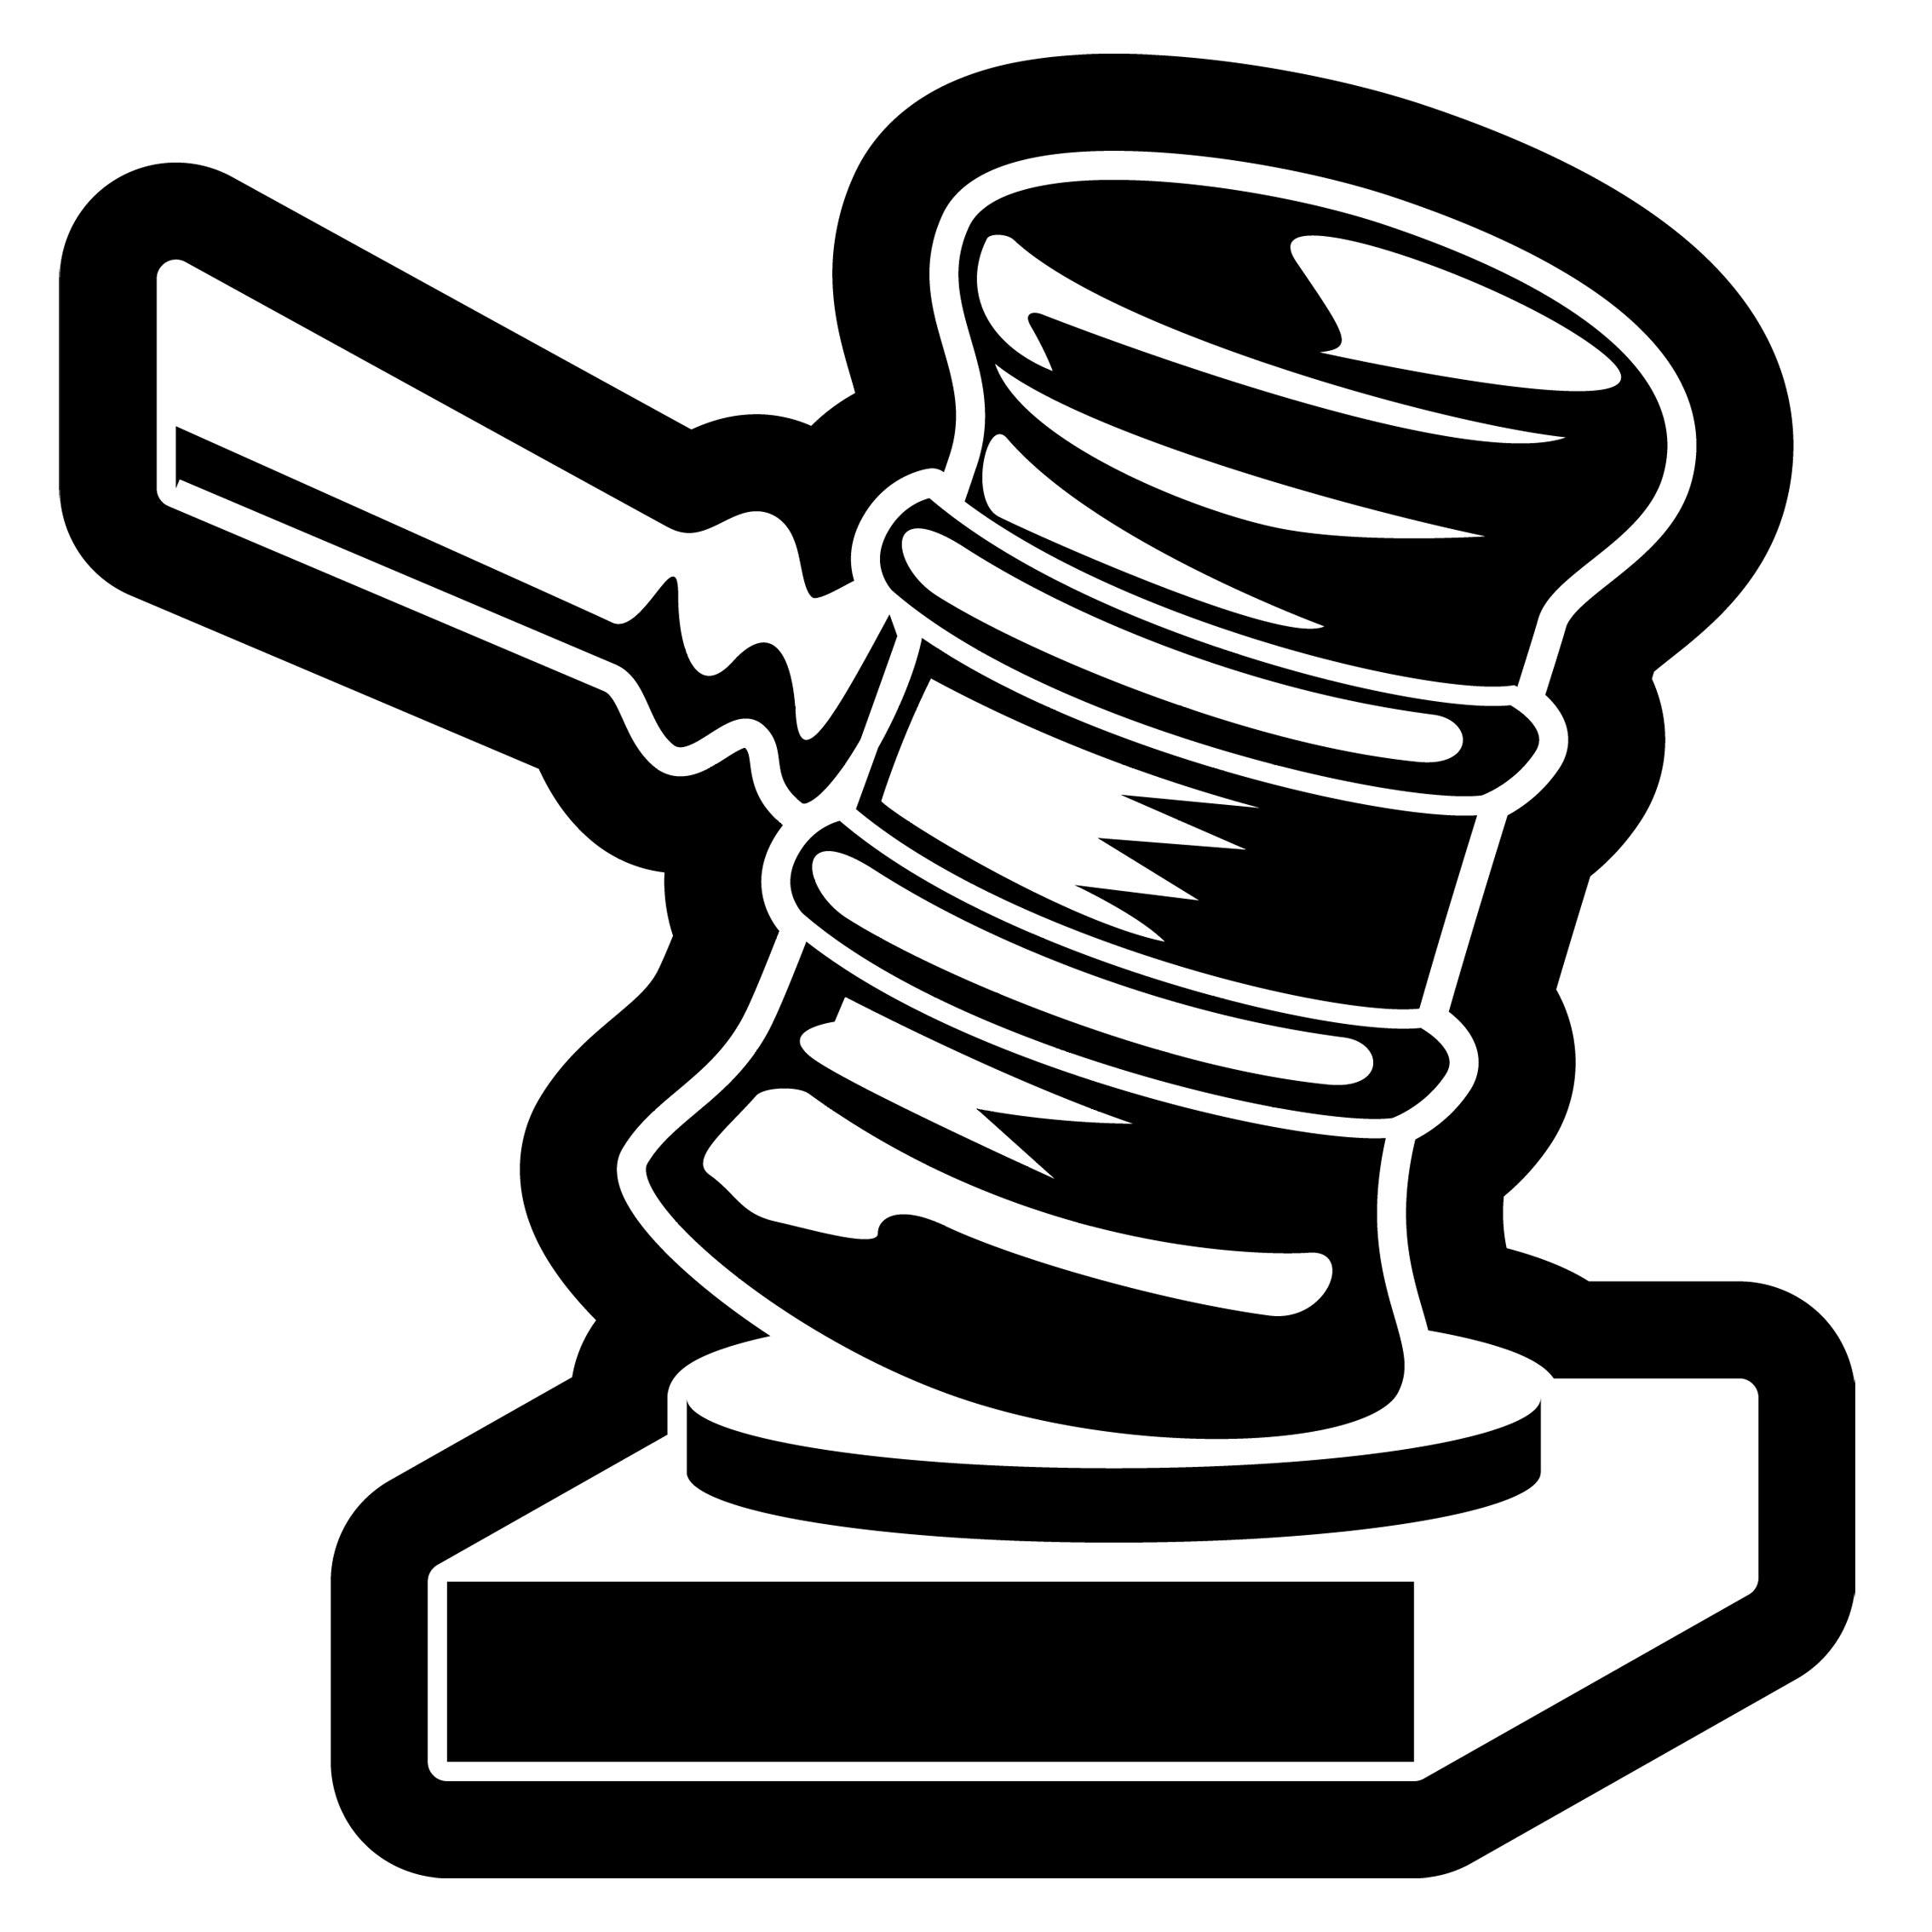 Law clipart Law Clip Art Image.